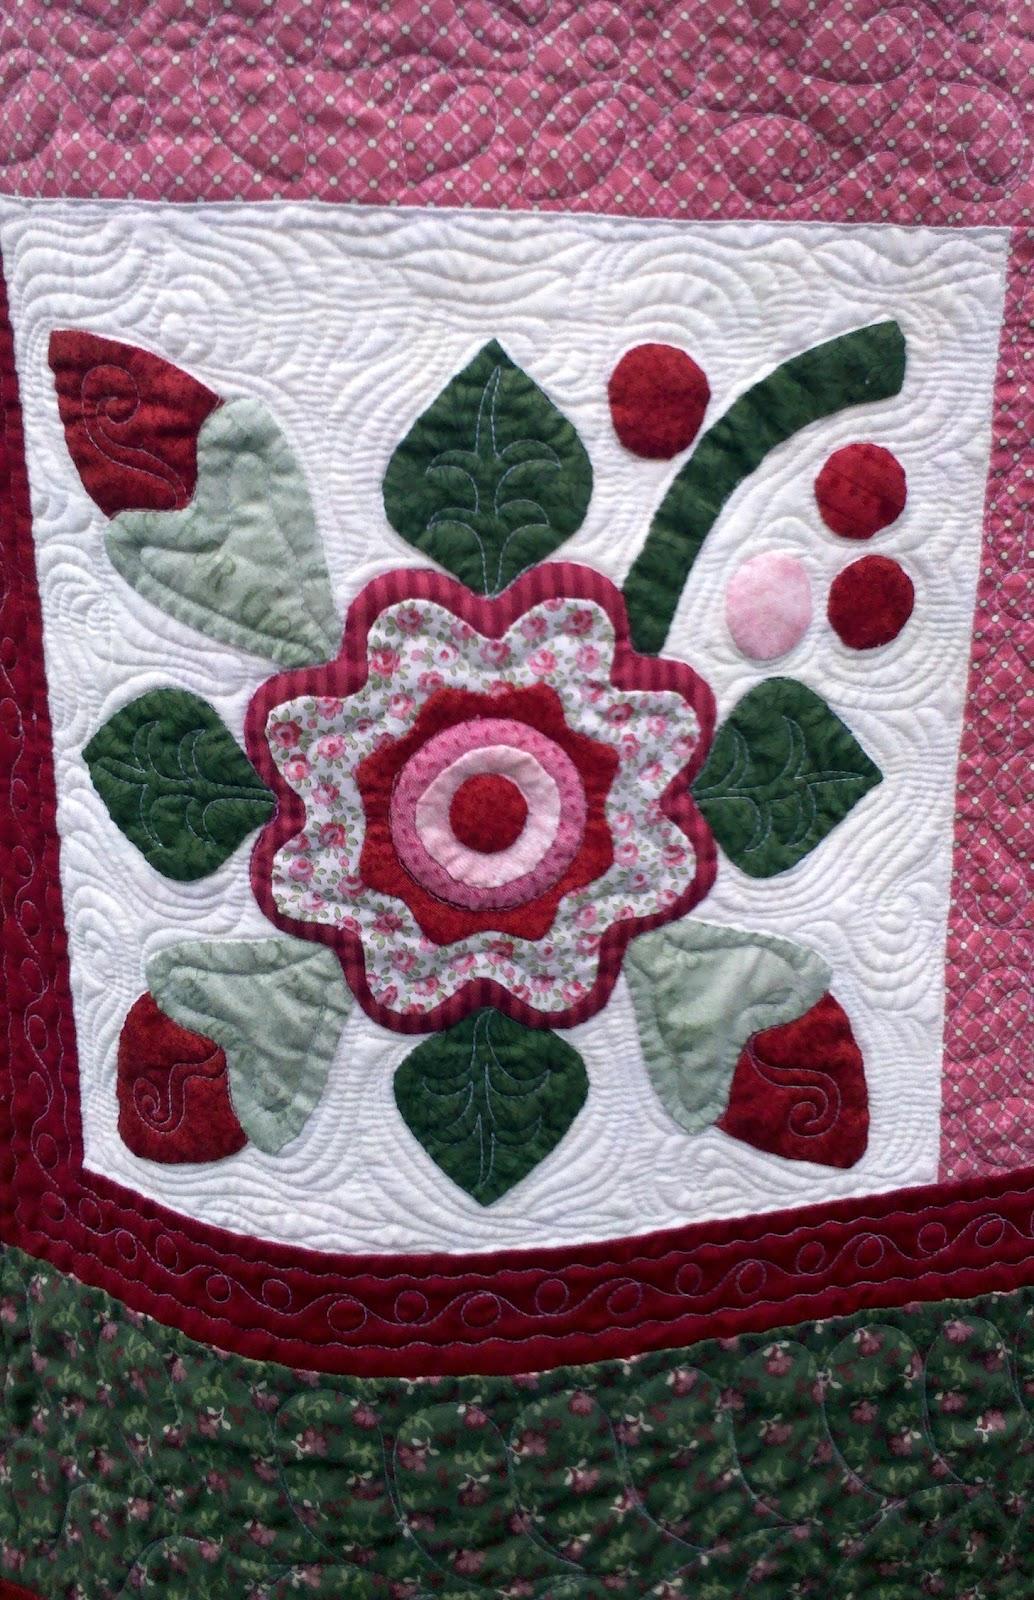 Karen's Quilts, Crows and Cardinals: Airing of the Quilts! : airing of the quilts tunkhannock pa - Adamdwight.com